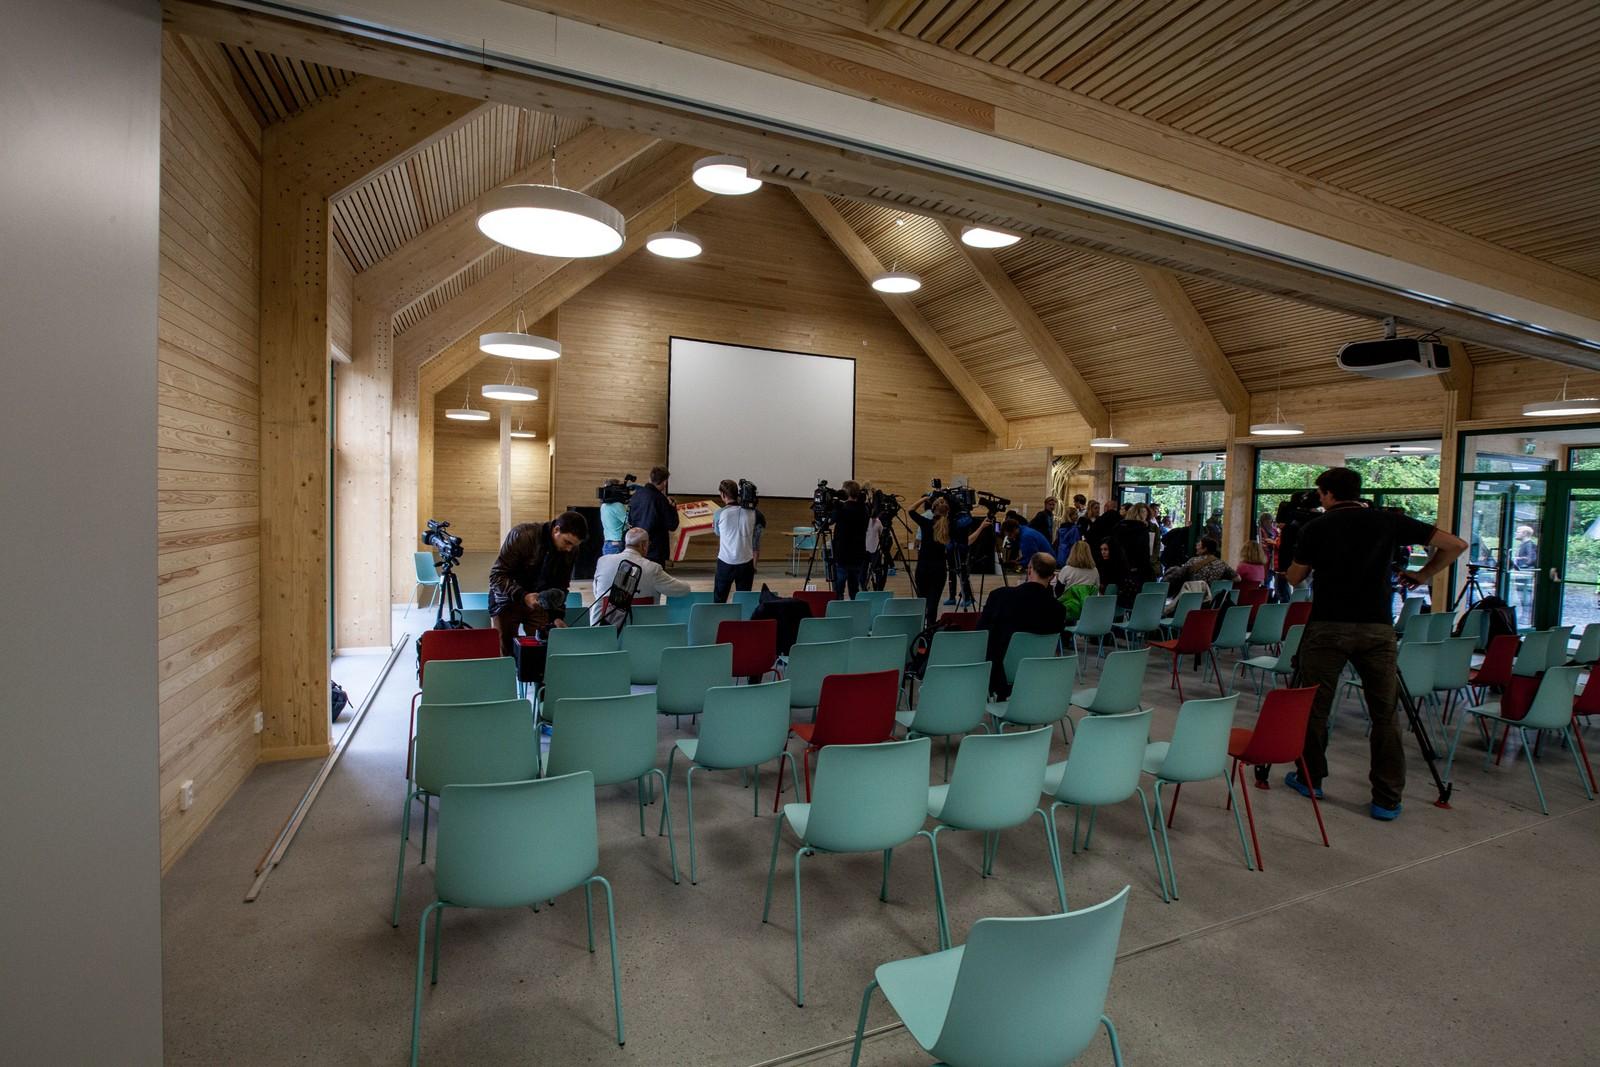 I konferansesalen var det onsdag to pressekonferanser, en for utenlandsk presse og en for de norske journalistene.